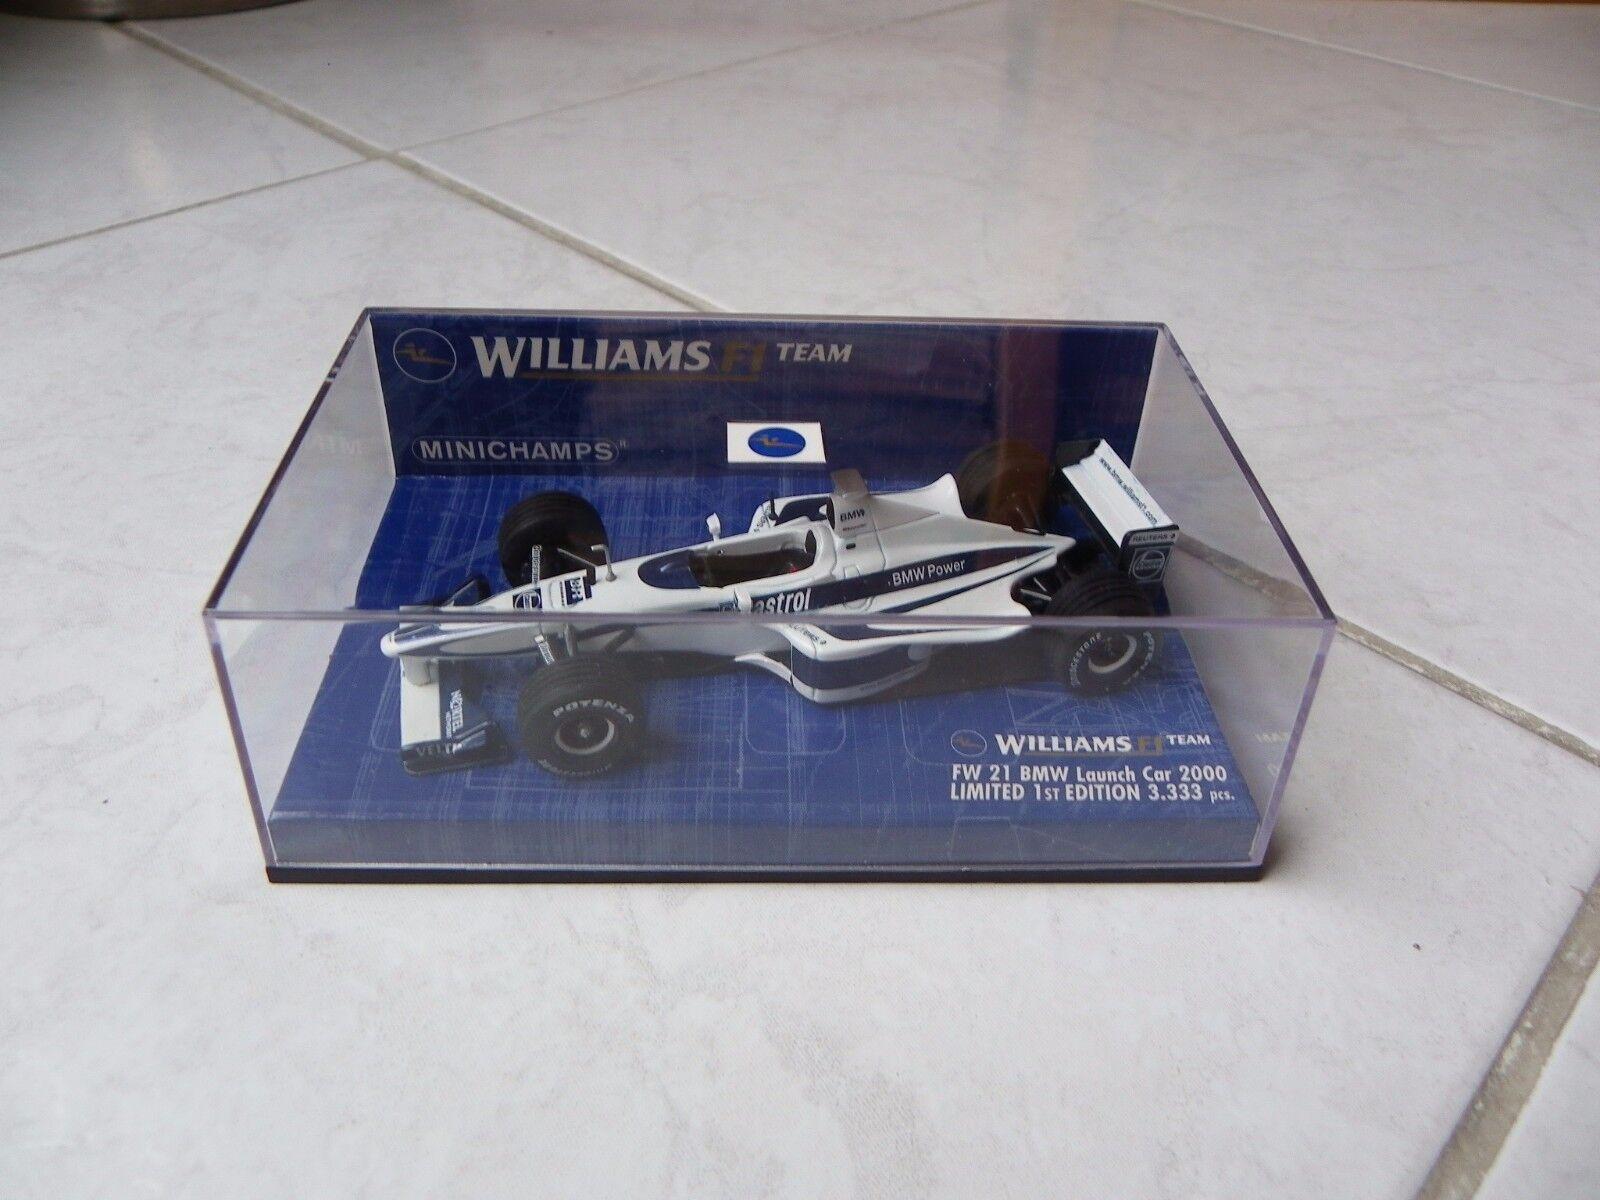 Williams Bmw FW21 Launch Car 2000 Ralf Schumacher no.9 Minichamps 1 43 2000 F1